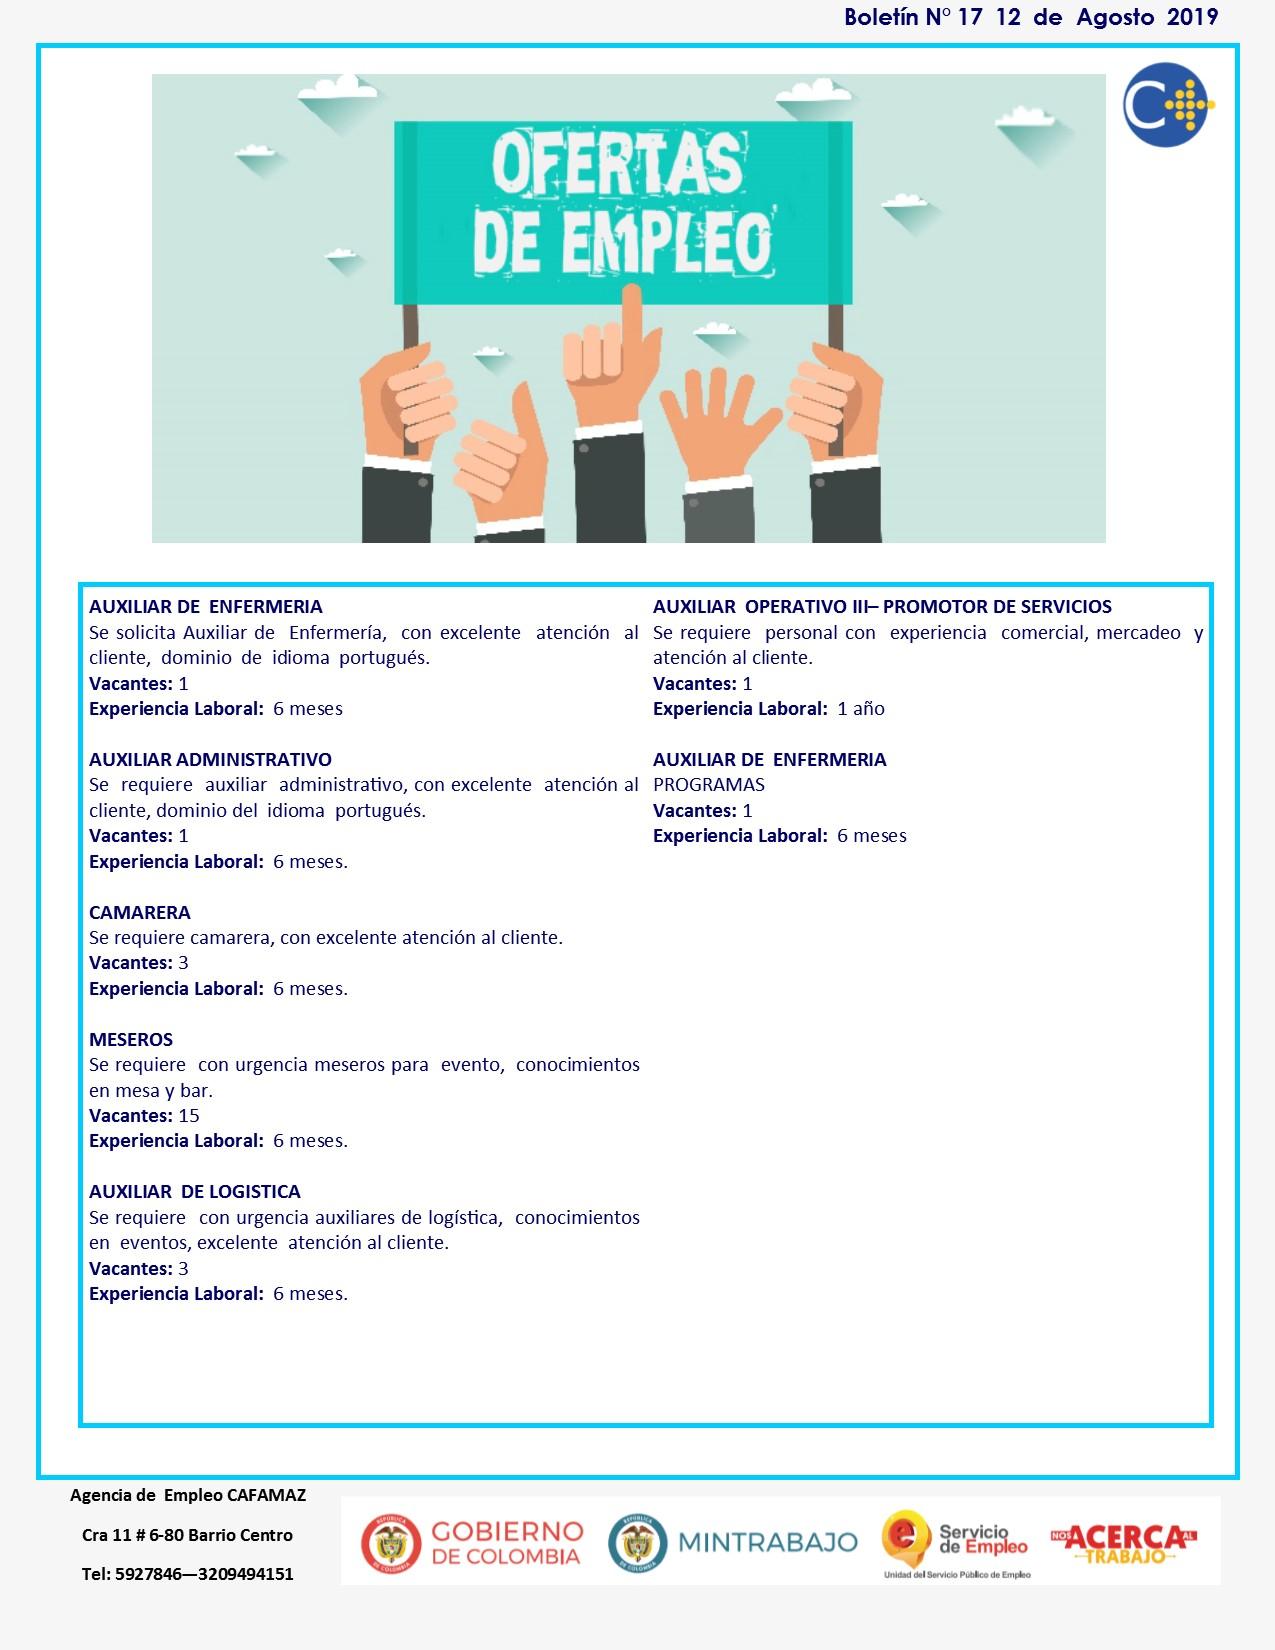 Boletin #17 | Agencia de Empleo